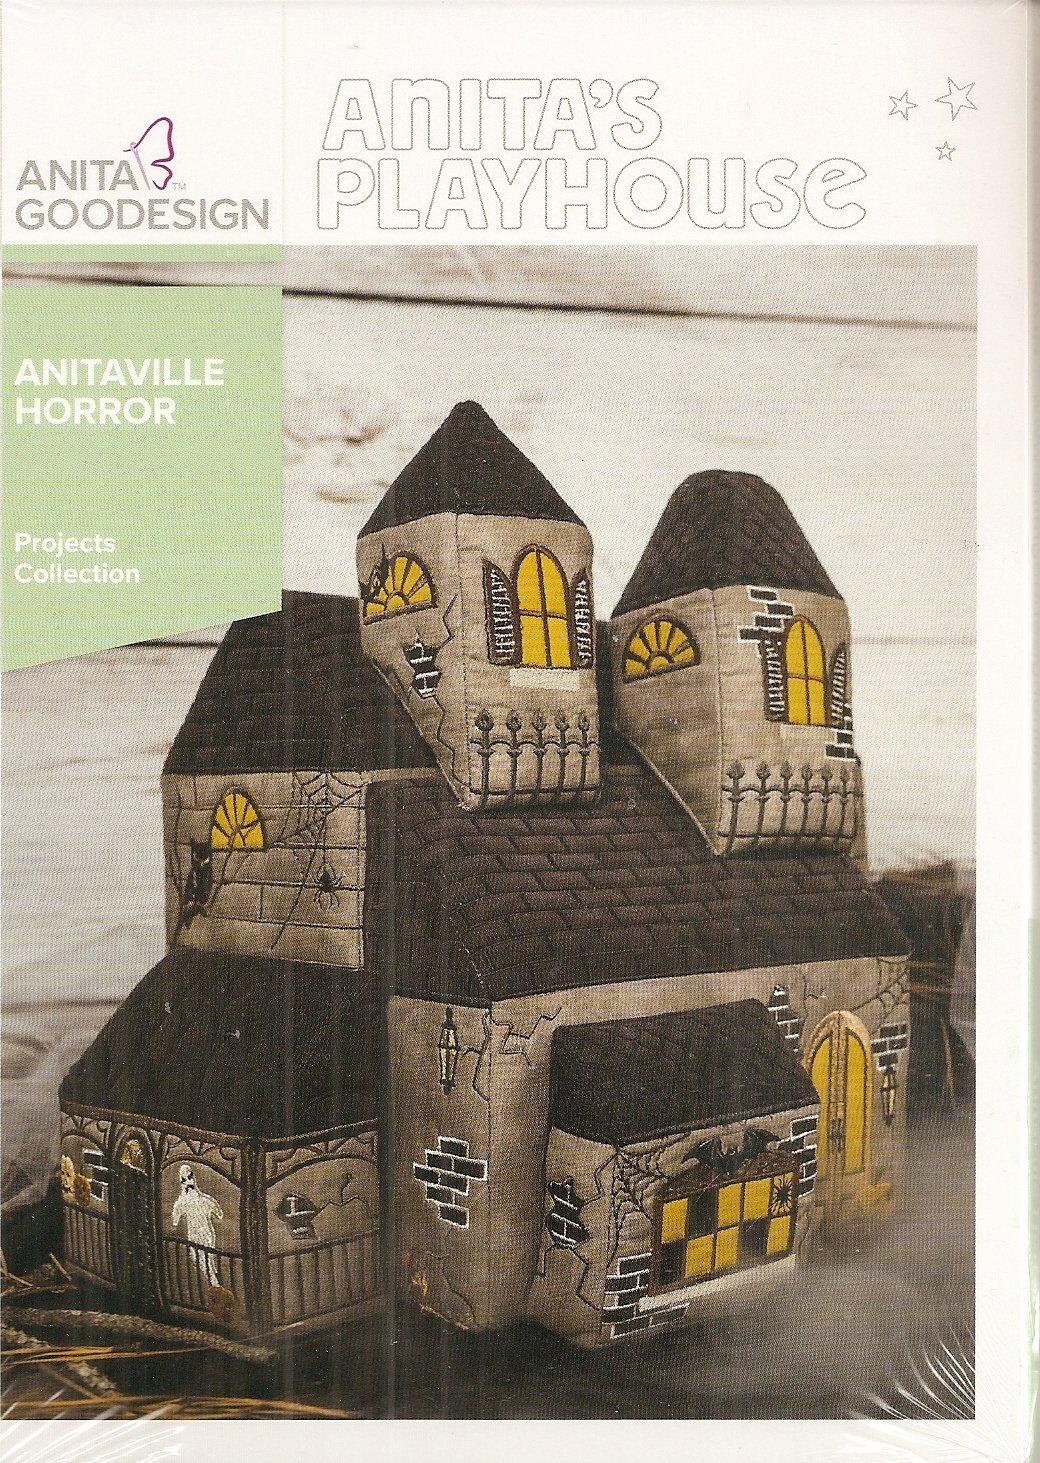 Anita Goodesign Projects Anitaville Horror